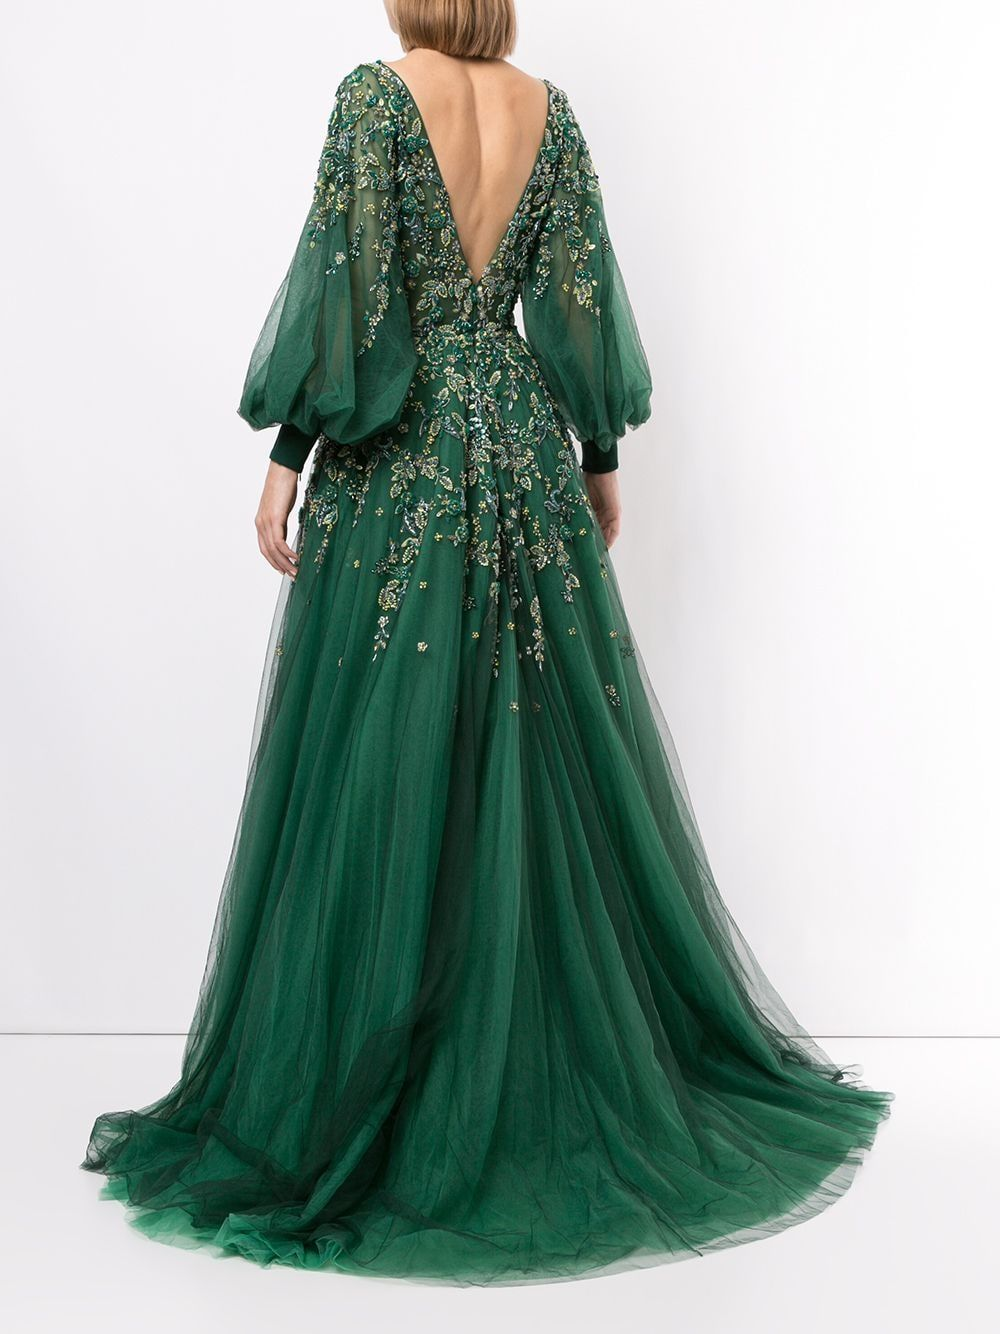 Saiid Kobeisy Long Sleeve Flared Dress Farfetch Green Formal Dresses Fairytale Dress Fantasy Dress [ 1334 x 1000 Pixel ]